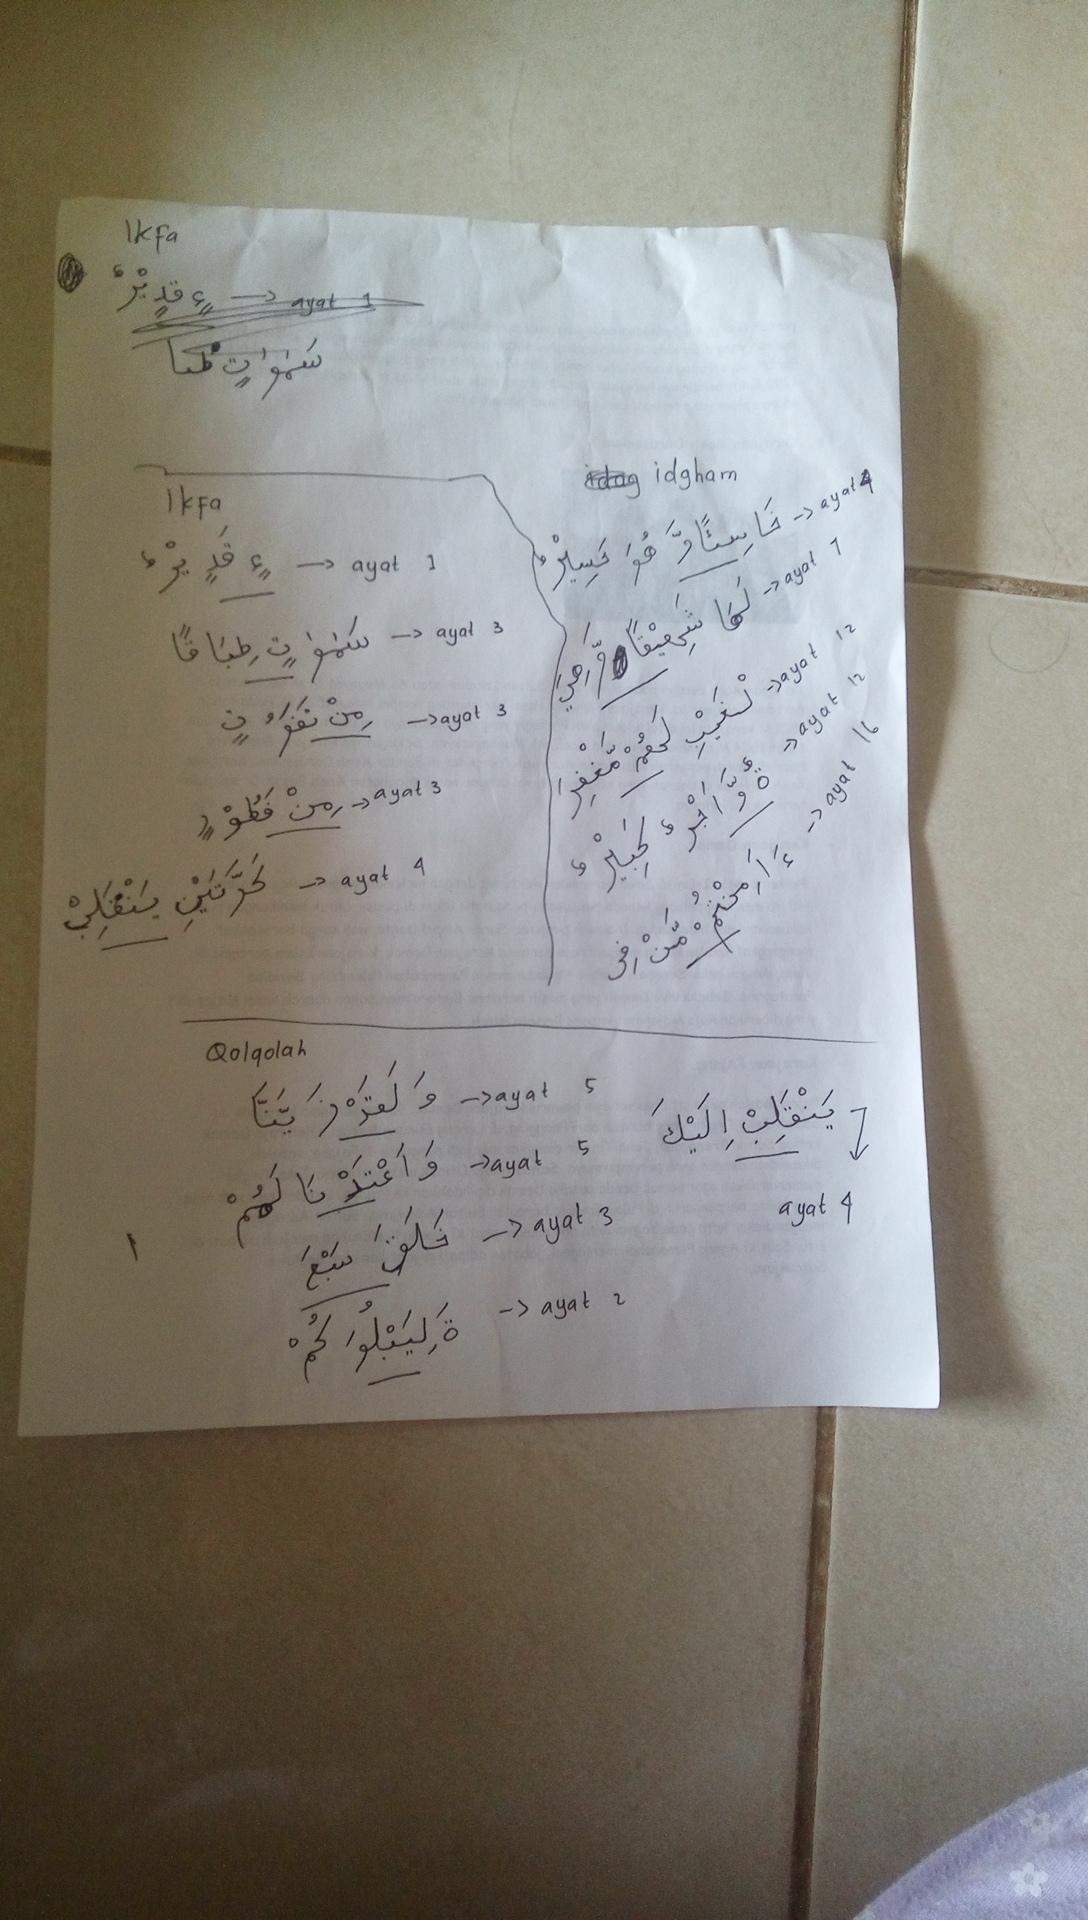 5 Ikhfa 5 Idgham 5 Qolqolah Dalam Surah Al Mulk Brainlycoid